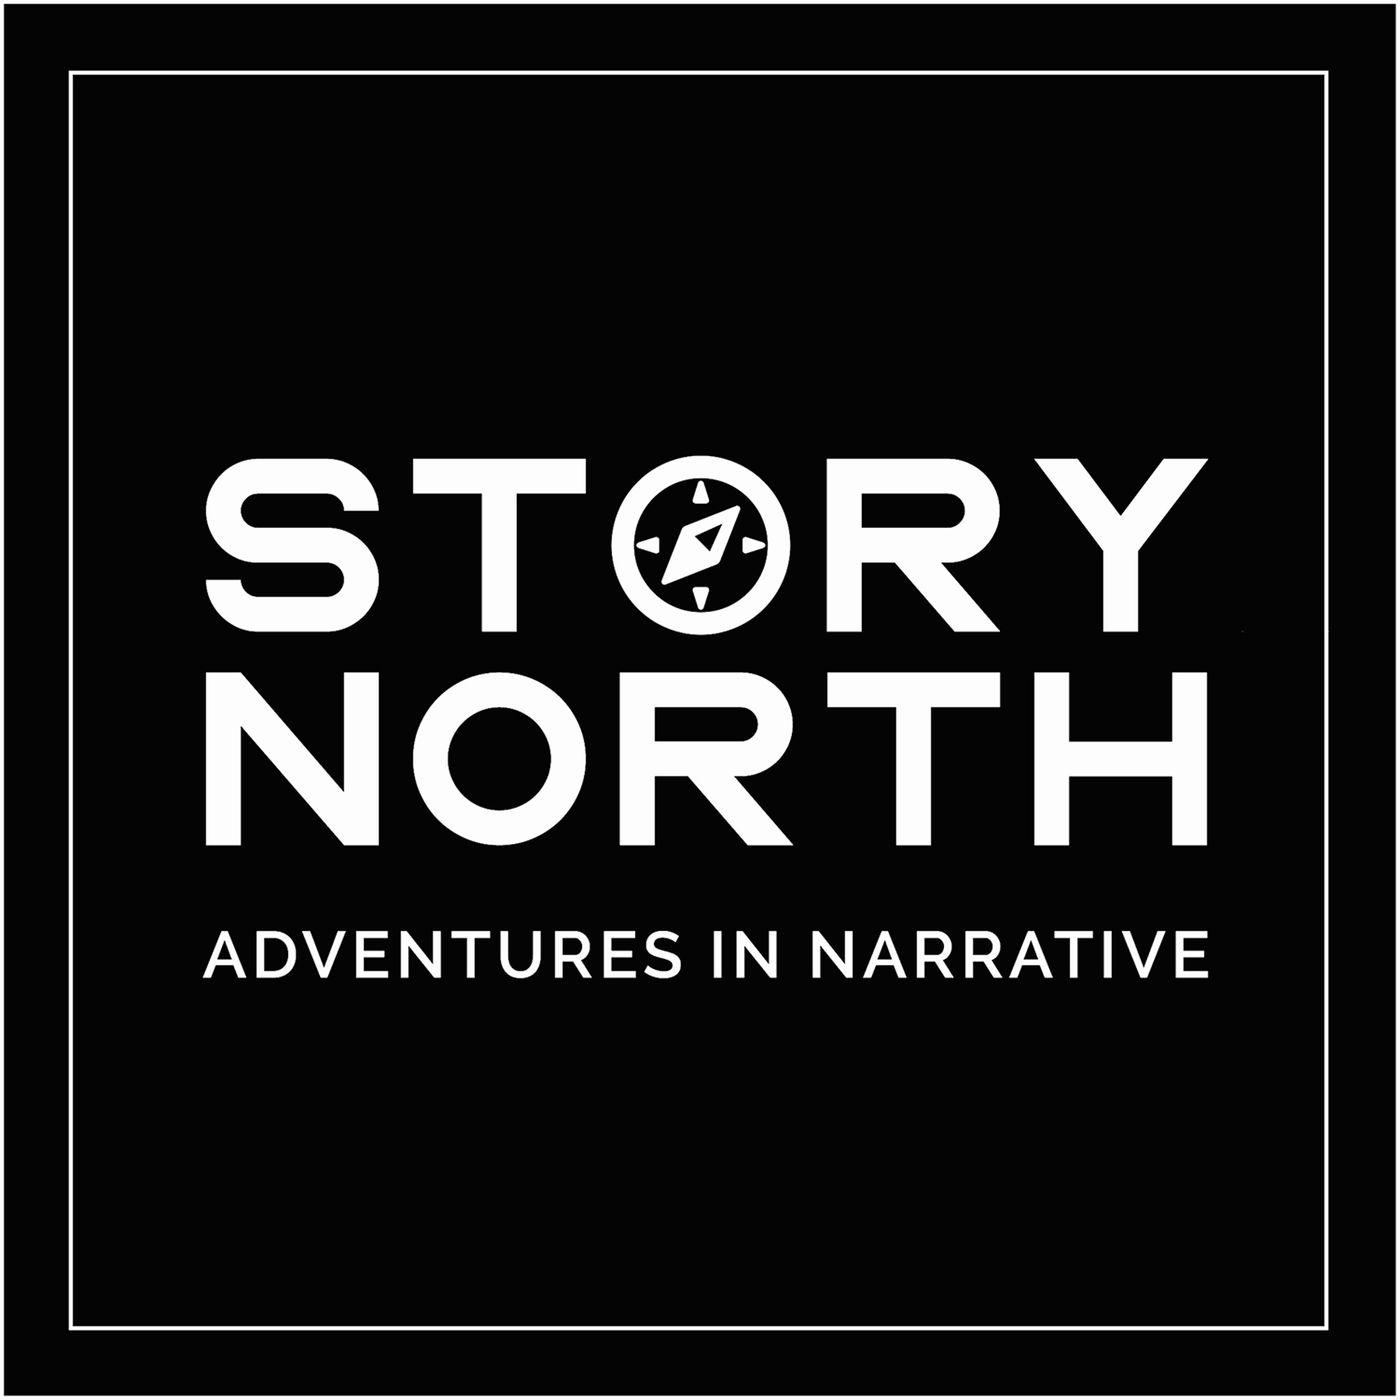 Story North